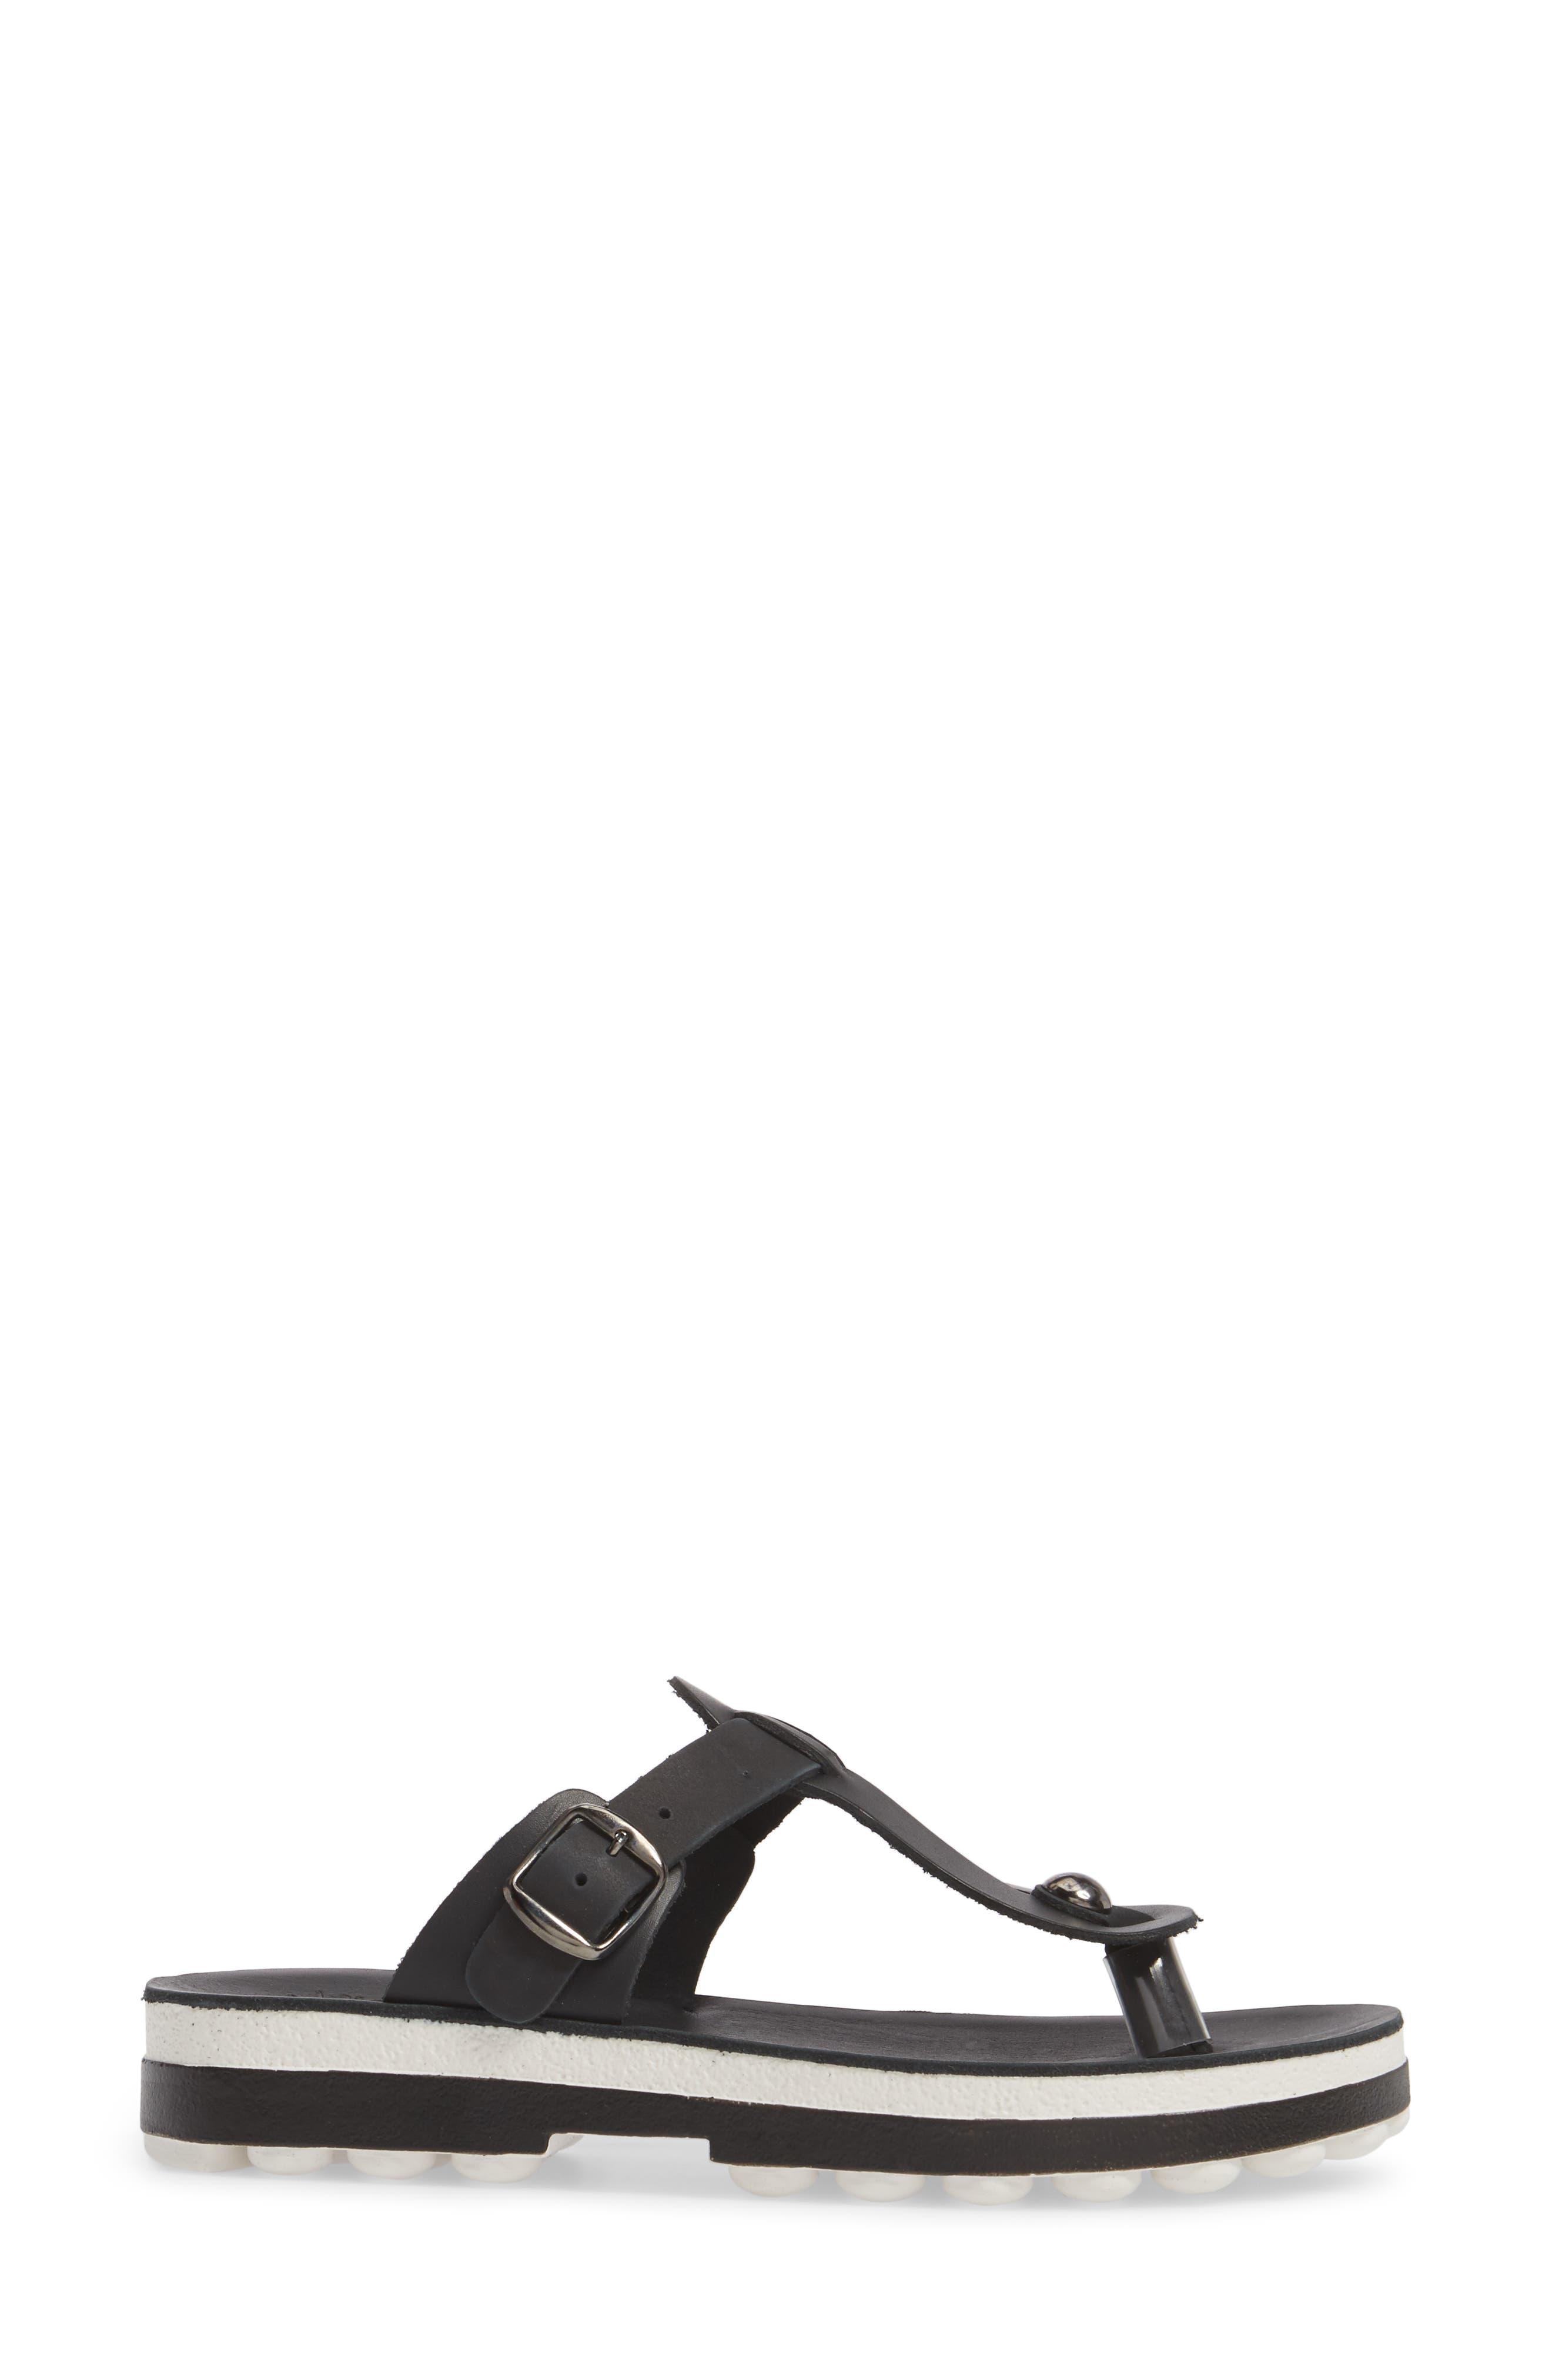 Mirabella Fantasy Sandal,                             Alternate thumbnail 3, color,                             BLACK LEATHER